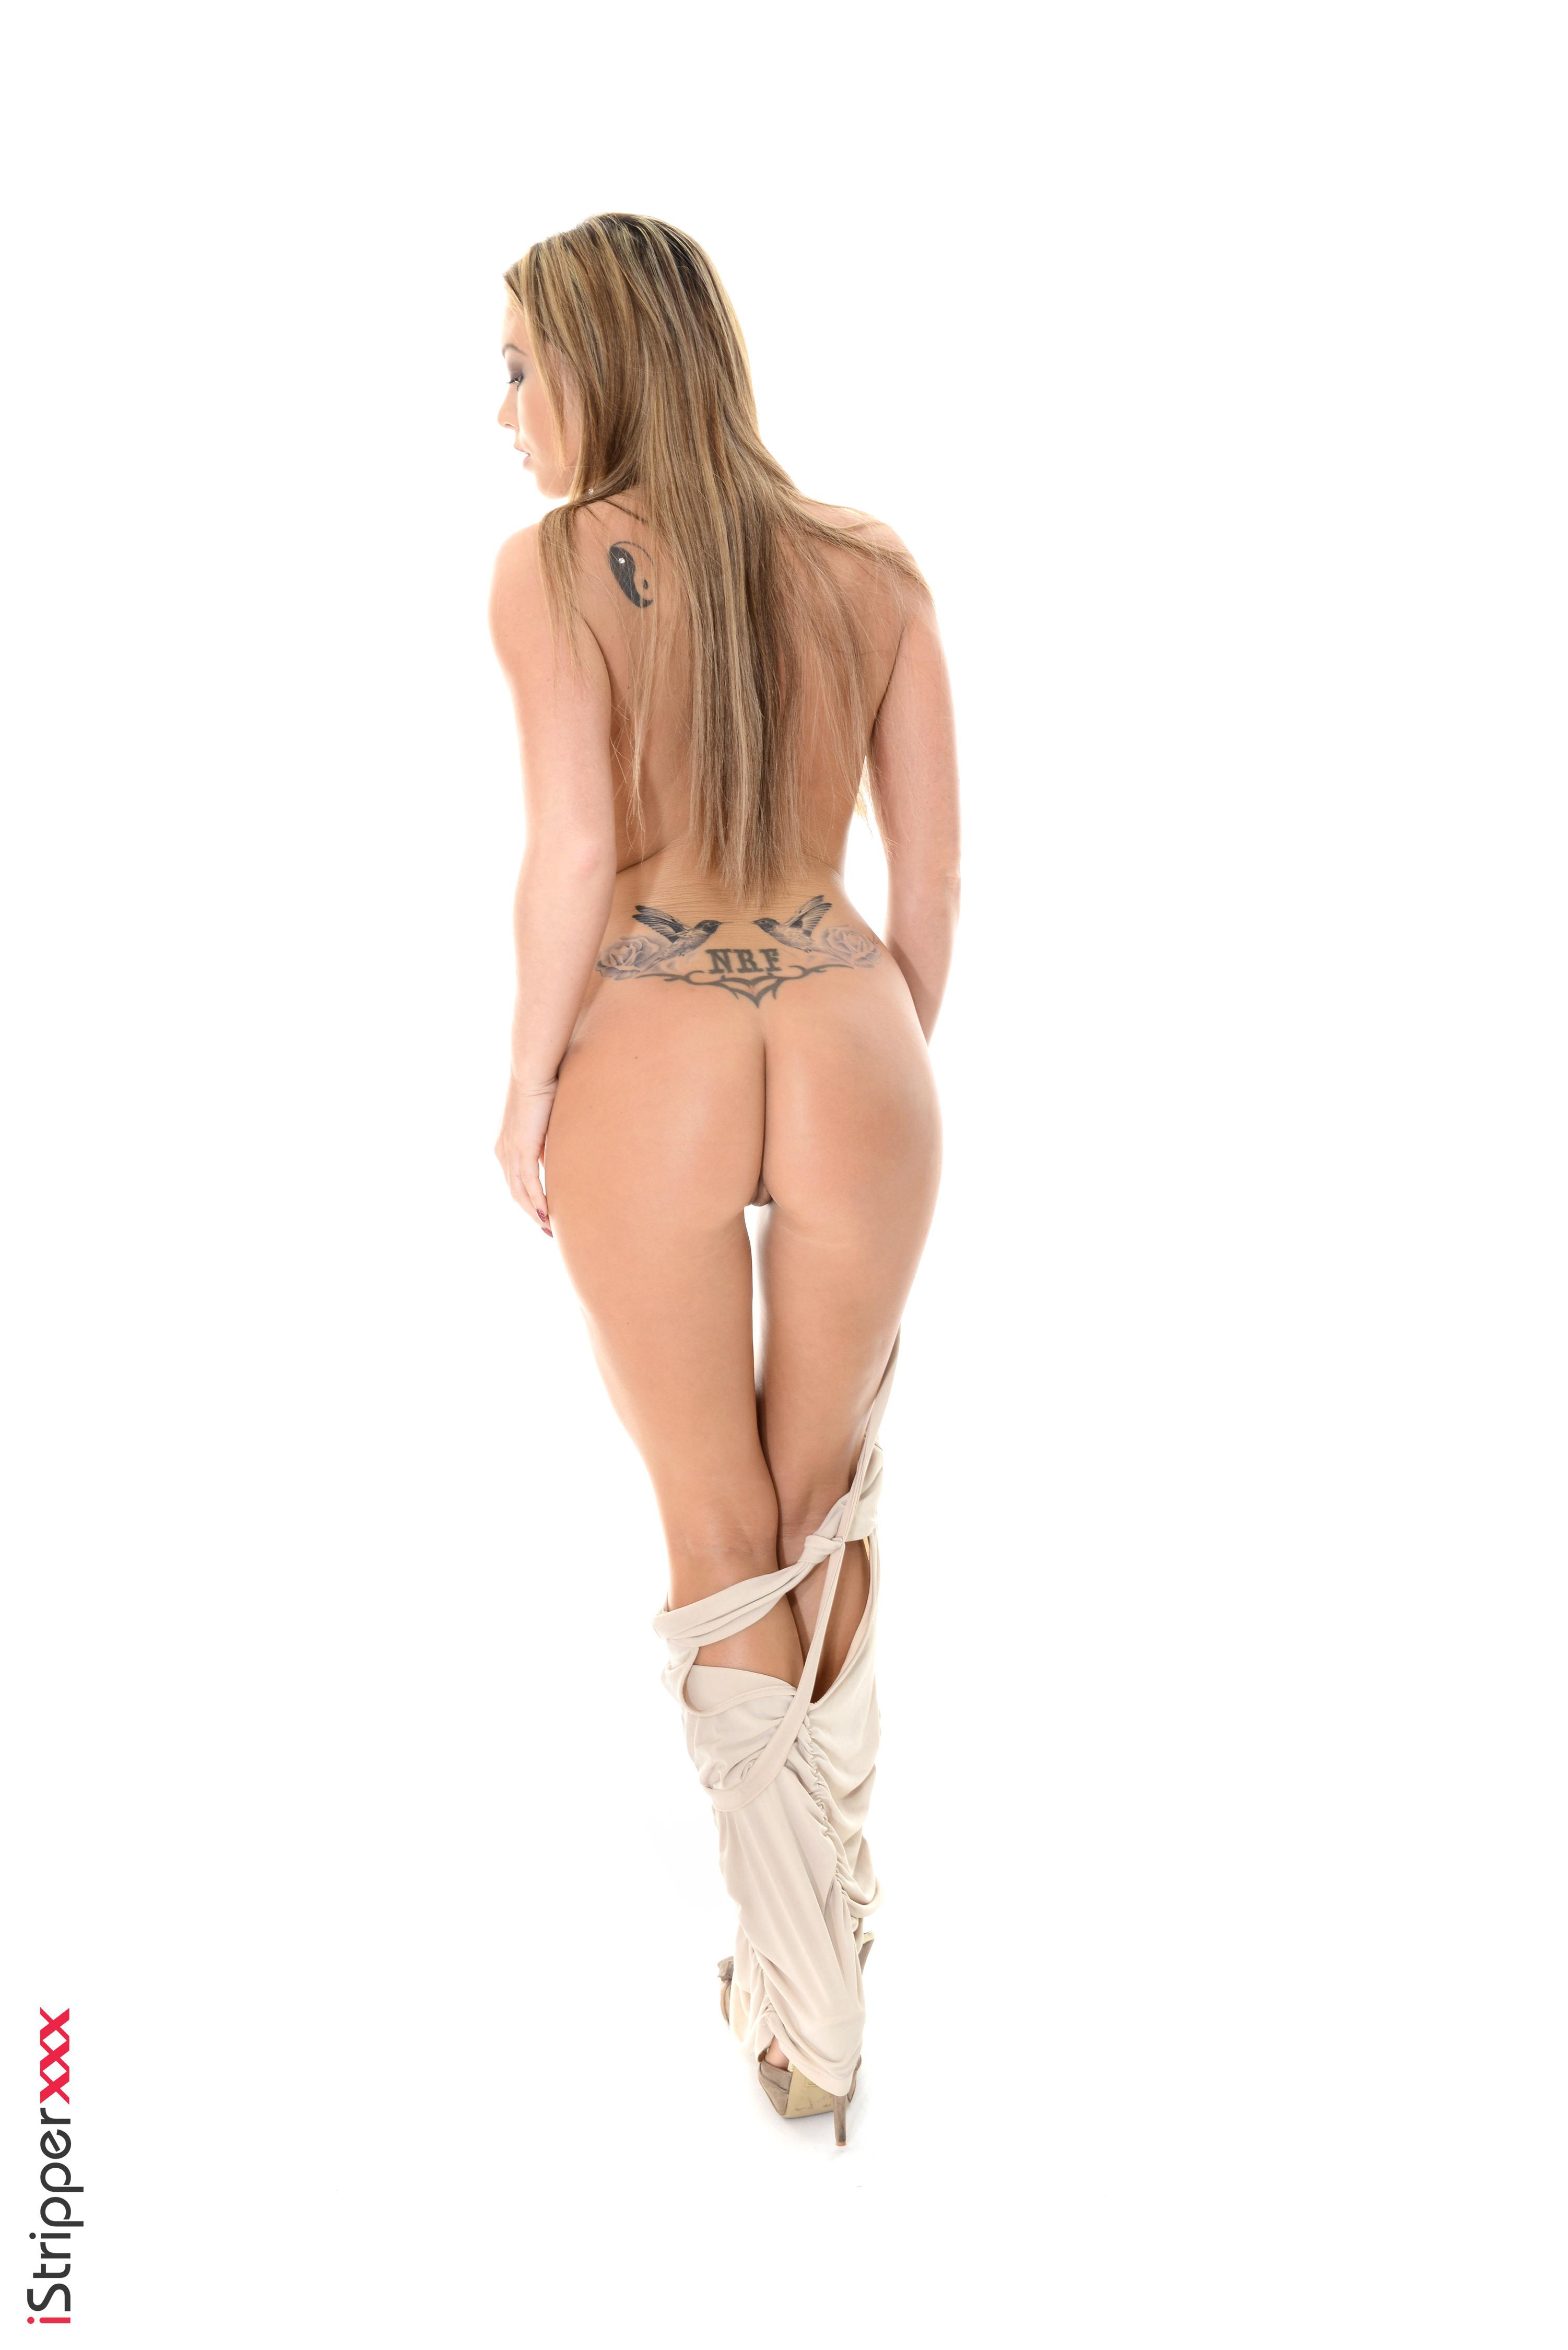 porn naked wallpaper